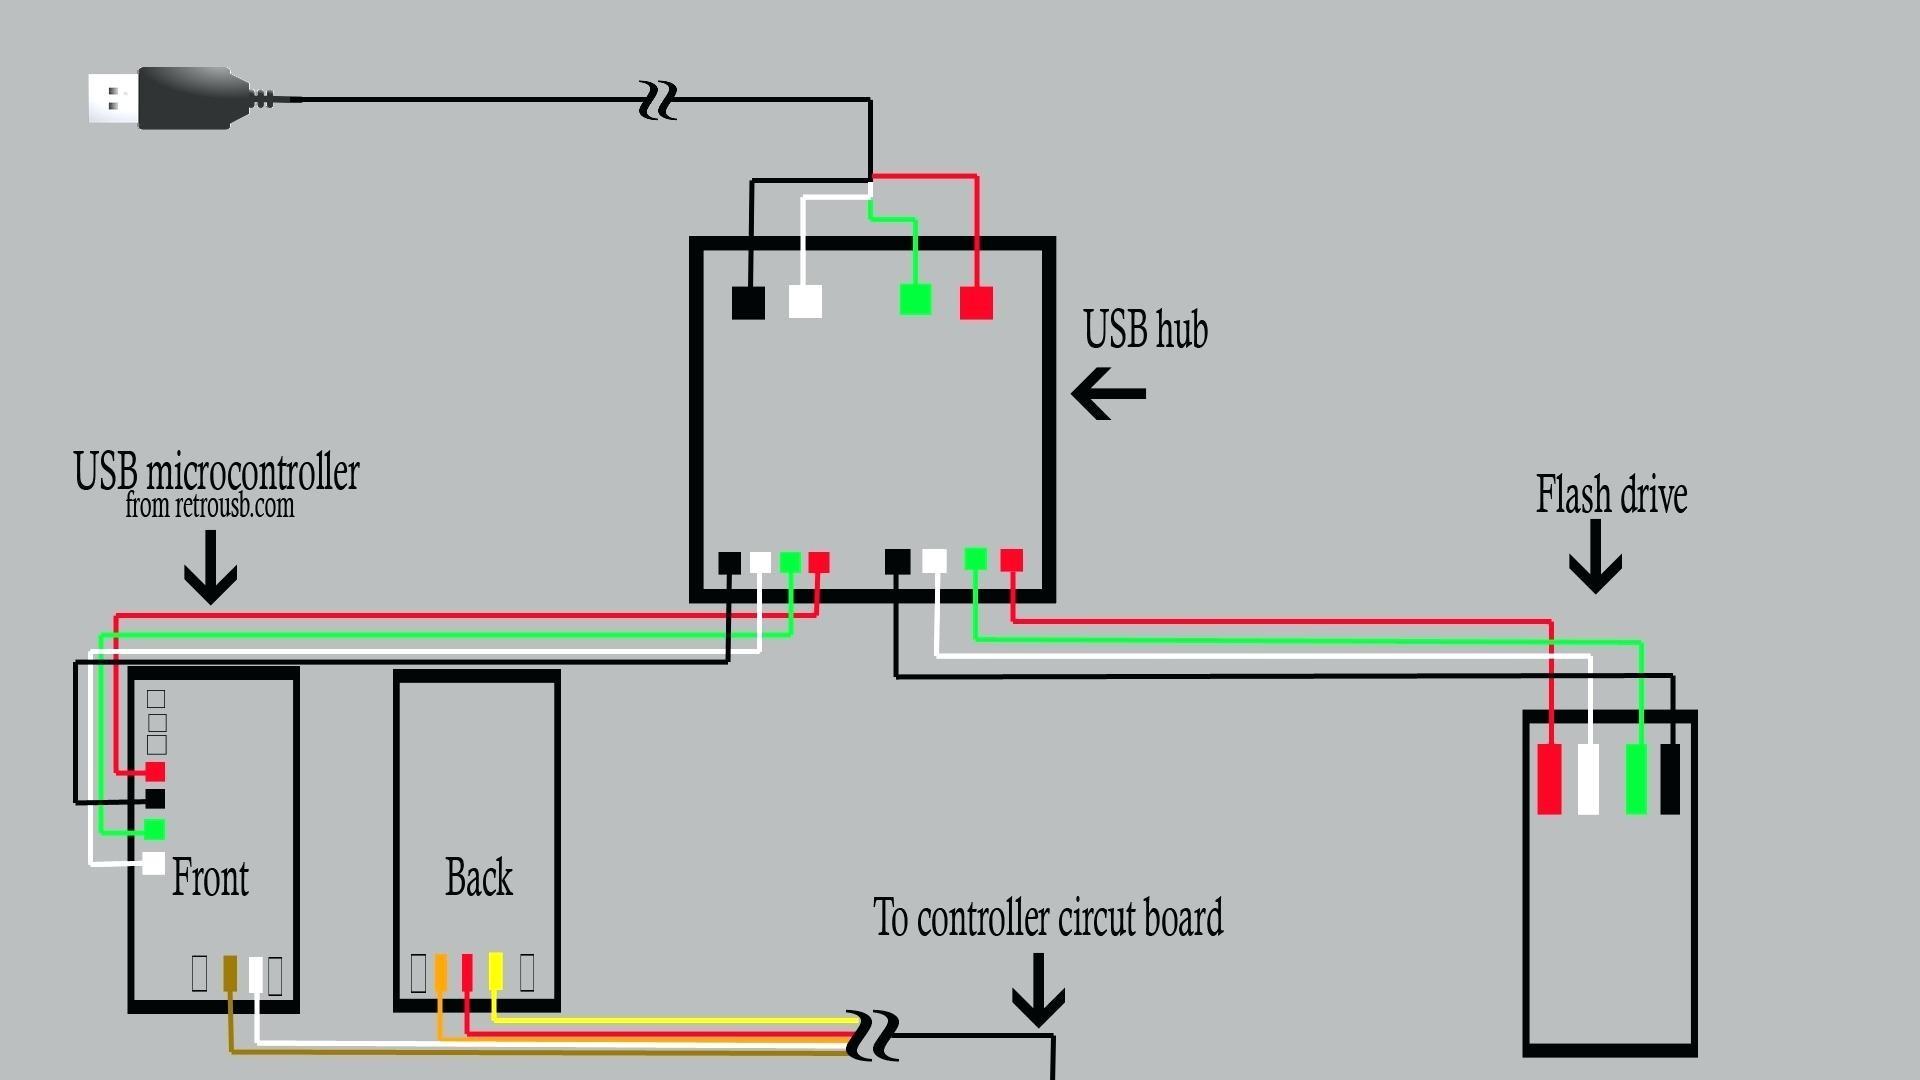 Ps2 Plug Wiring Diagram | Wiring Schematic Diagram Pollak Trailer Plug Wiring Diagram Kes on